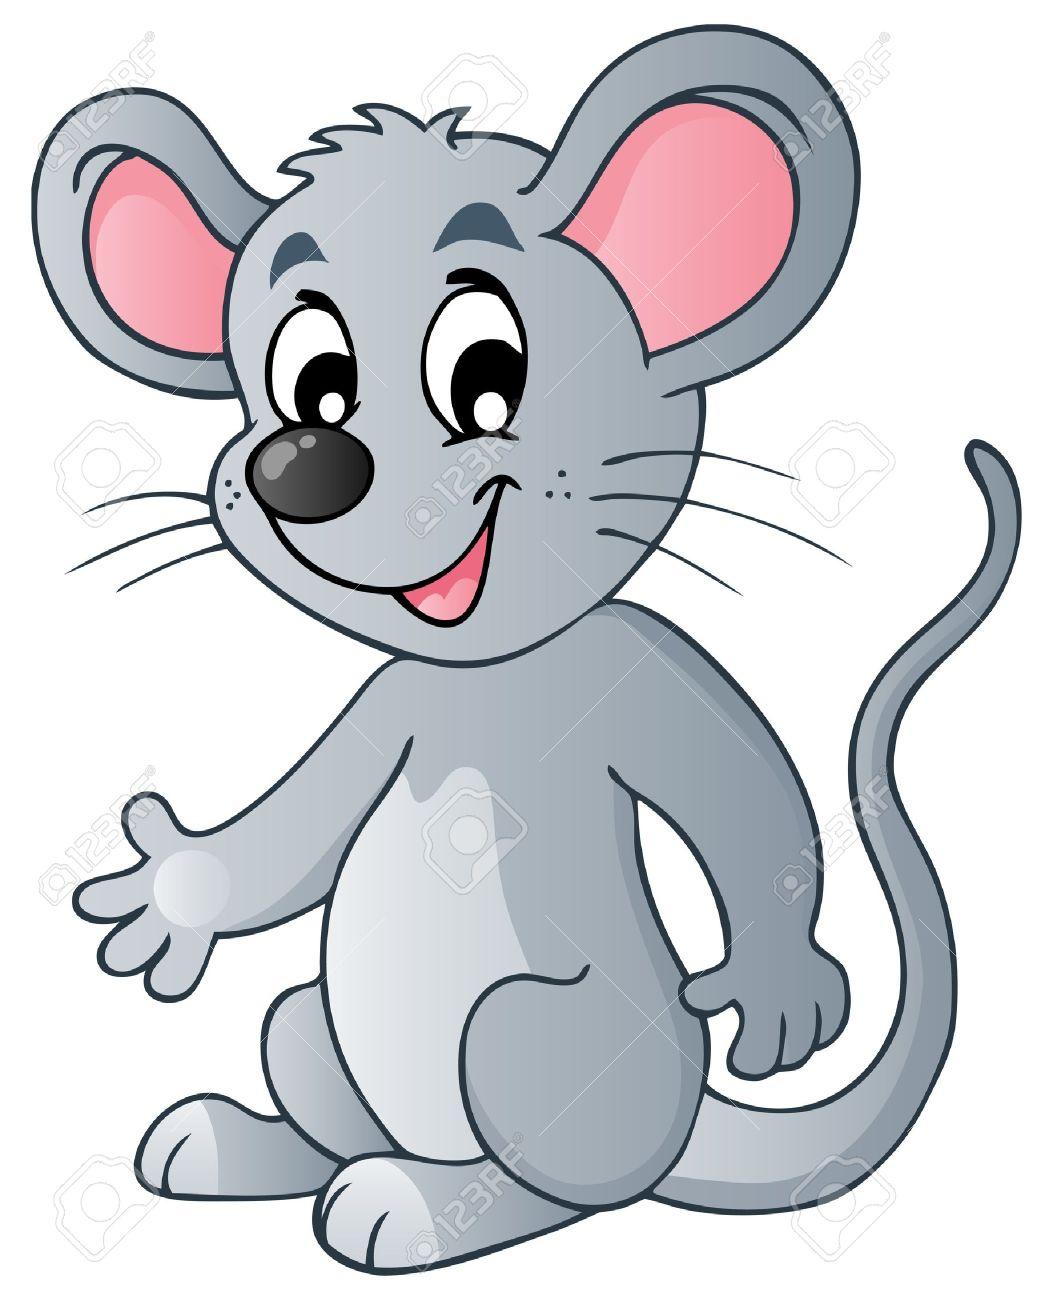 Cute cartoon mouse - vector illustration Stock Vector - 13057325